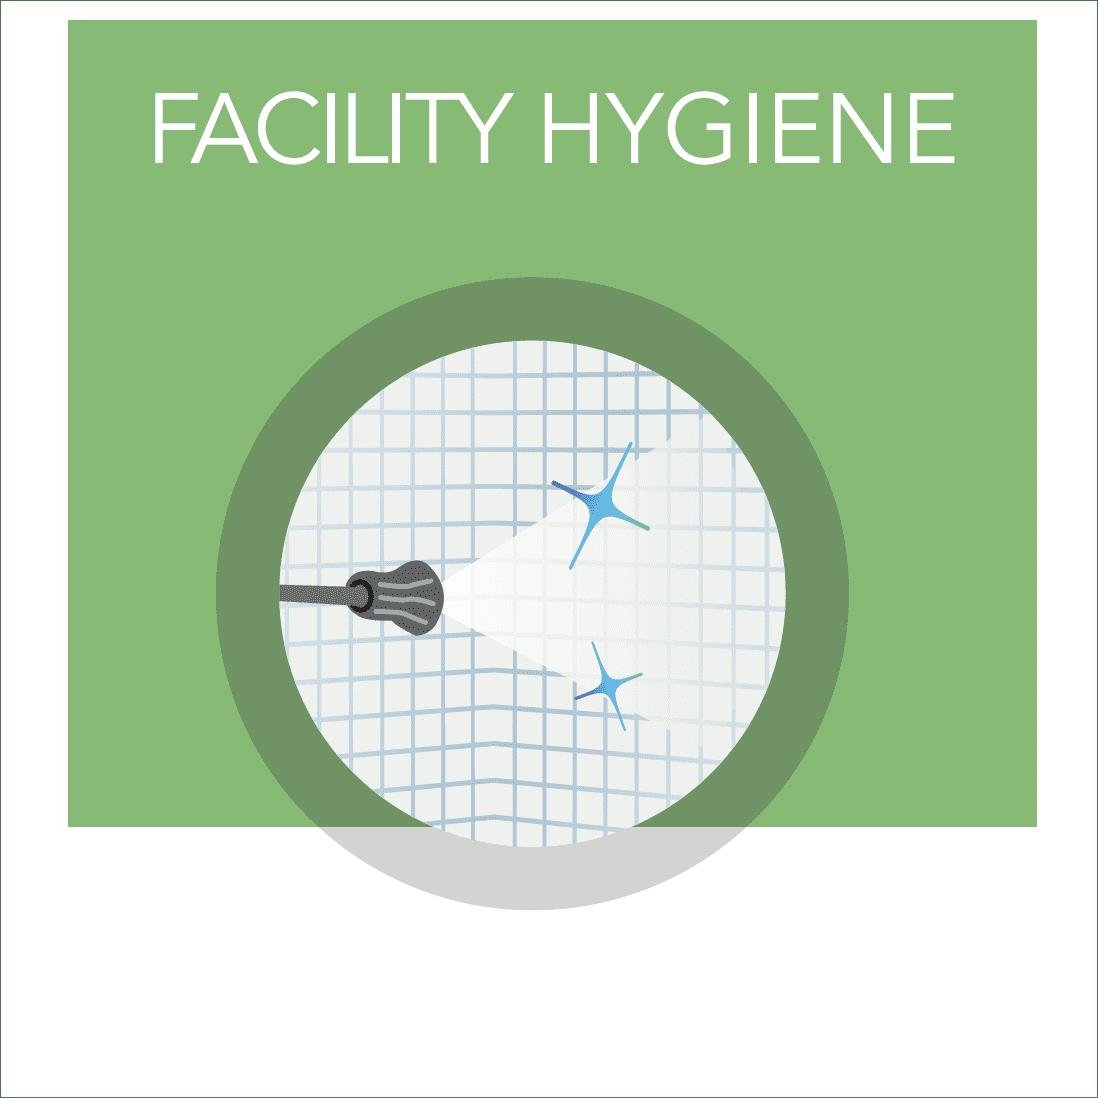 facility hygiene